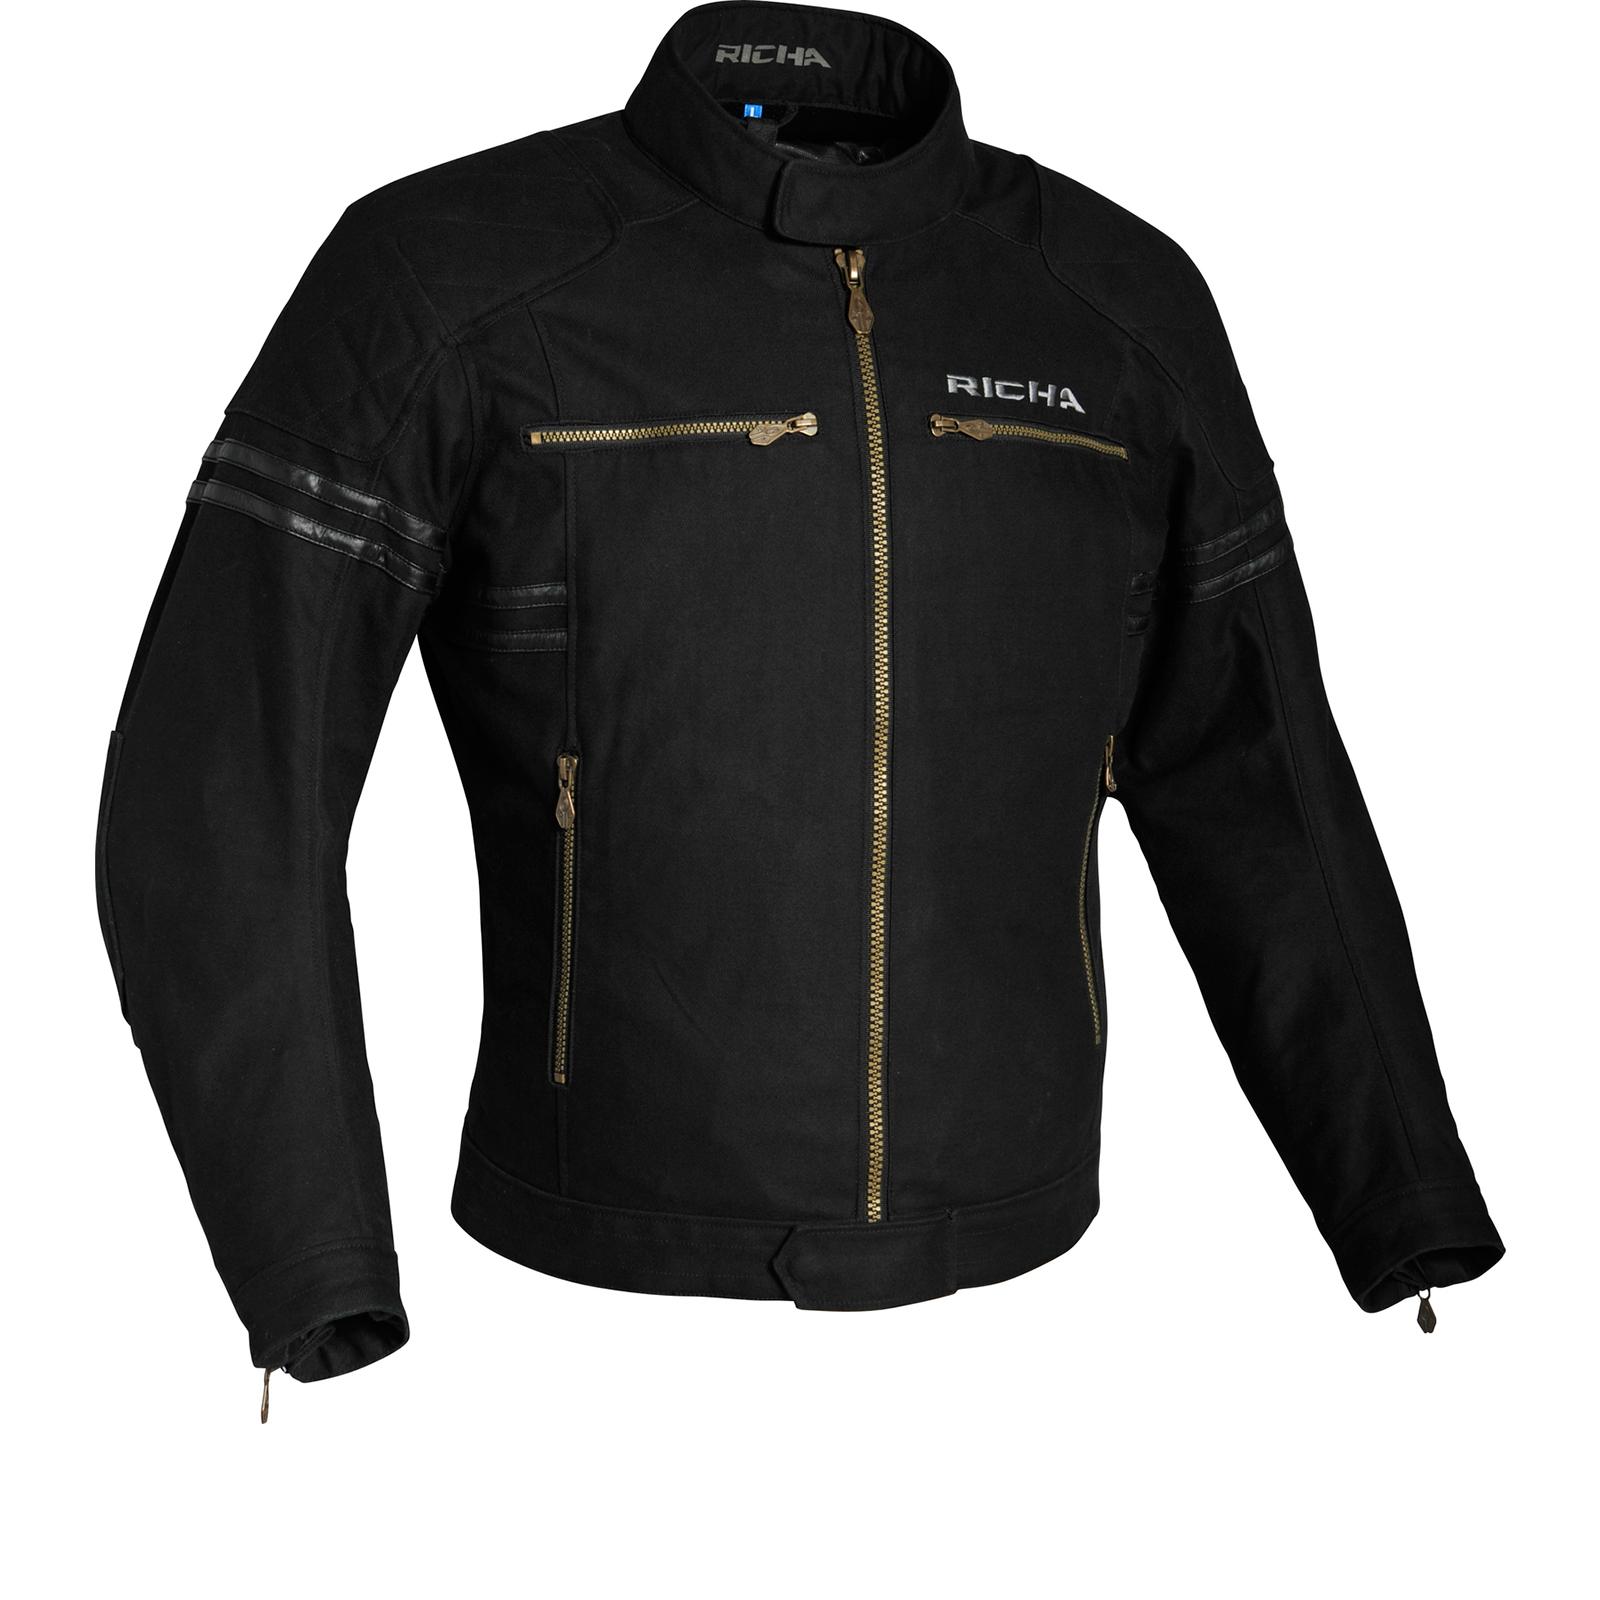 Richa Custom Motorcycle Jacket - Jackets